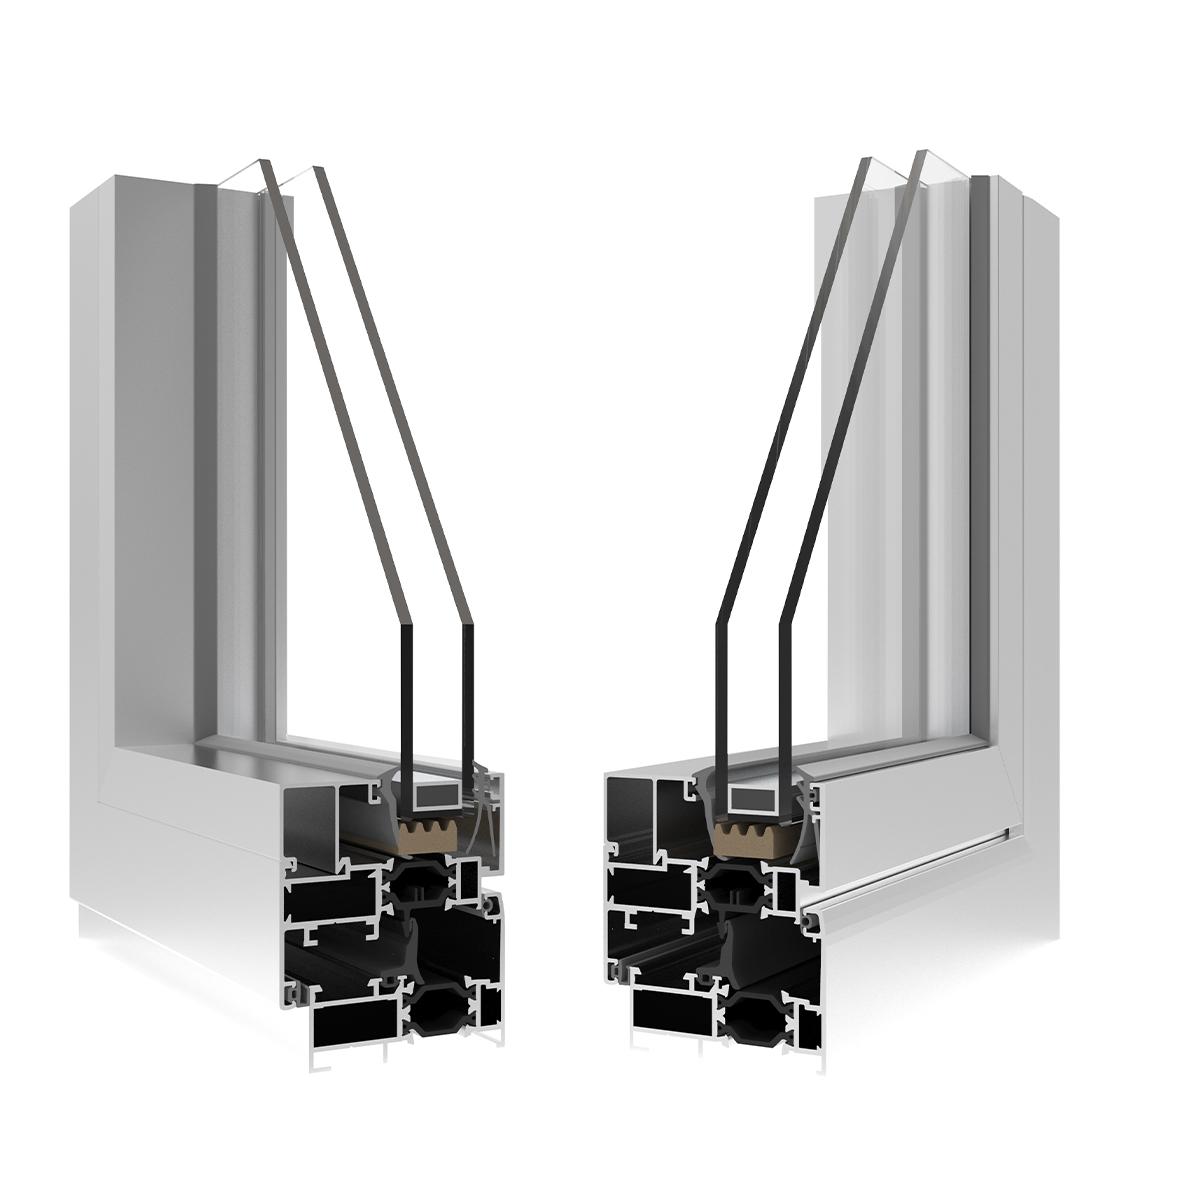 https://www.allpaint.it/wp-content/uploads/2021/07/thermika630-alluminio-allpaint.jpg